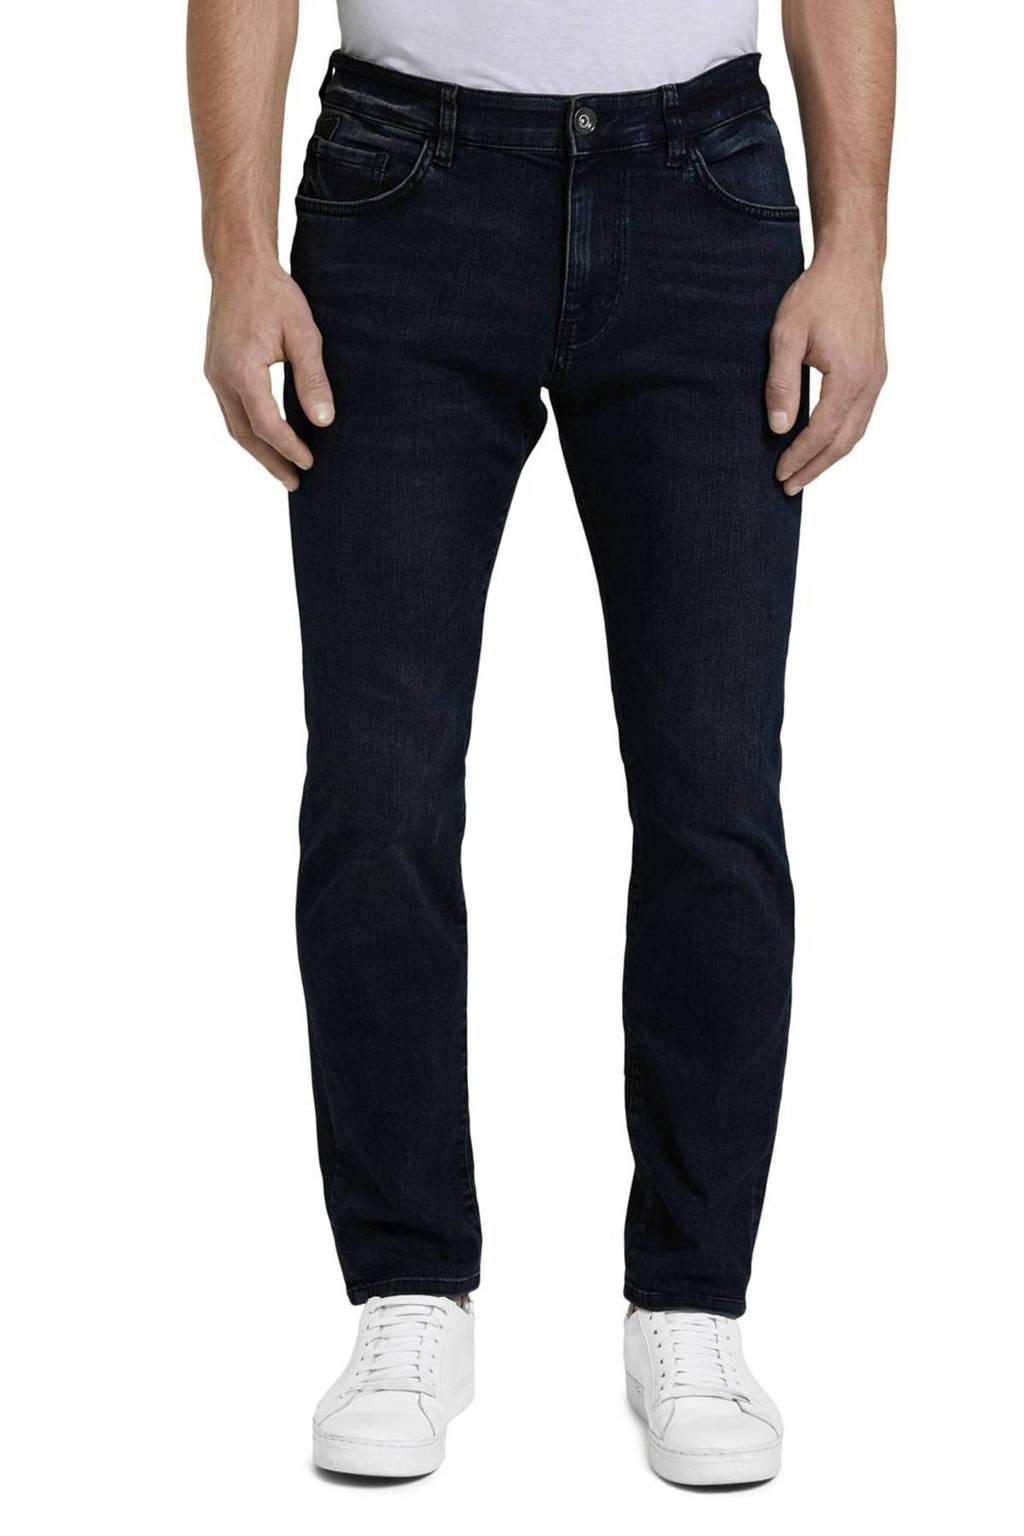 Tom Tailor straight fit jeans Marvin donkerblauw, 10136 Dark blue denim